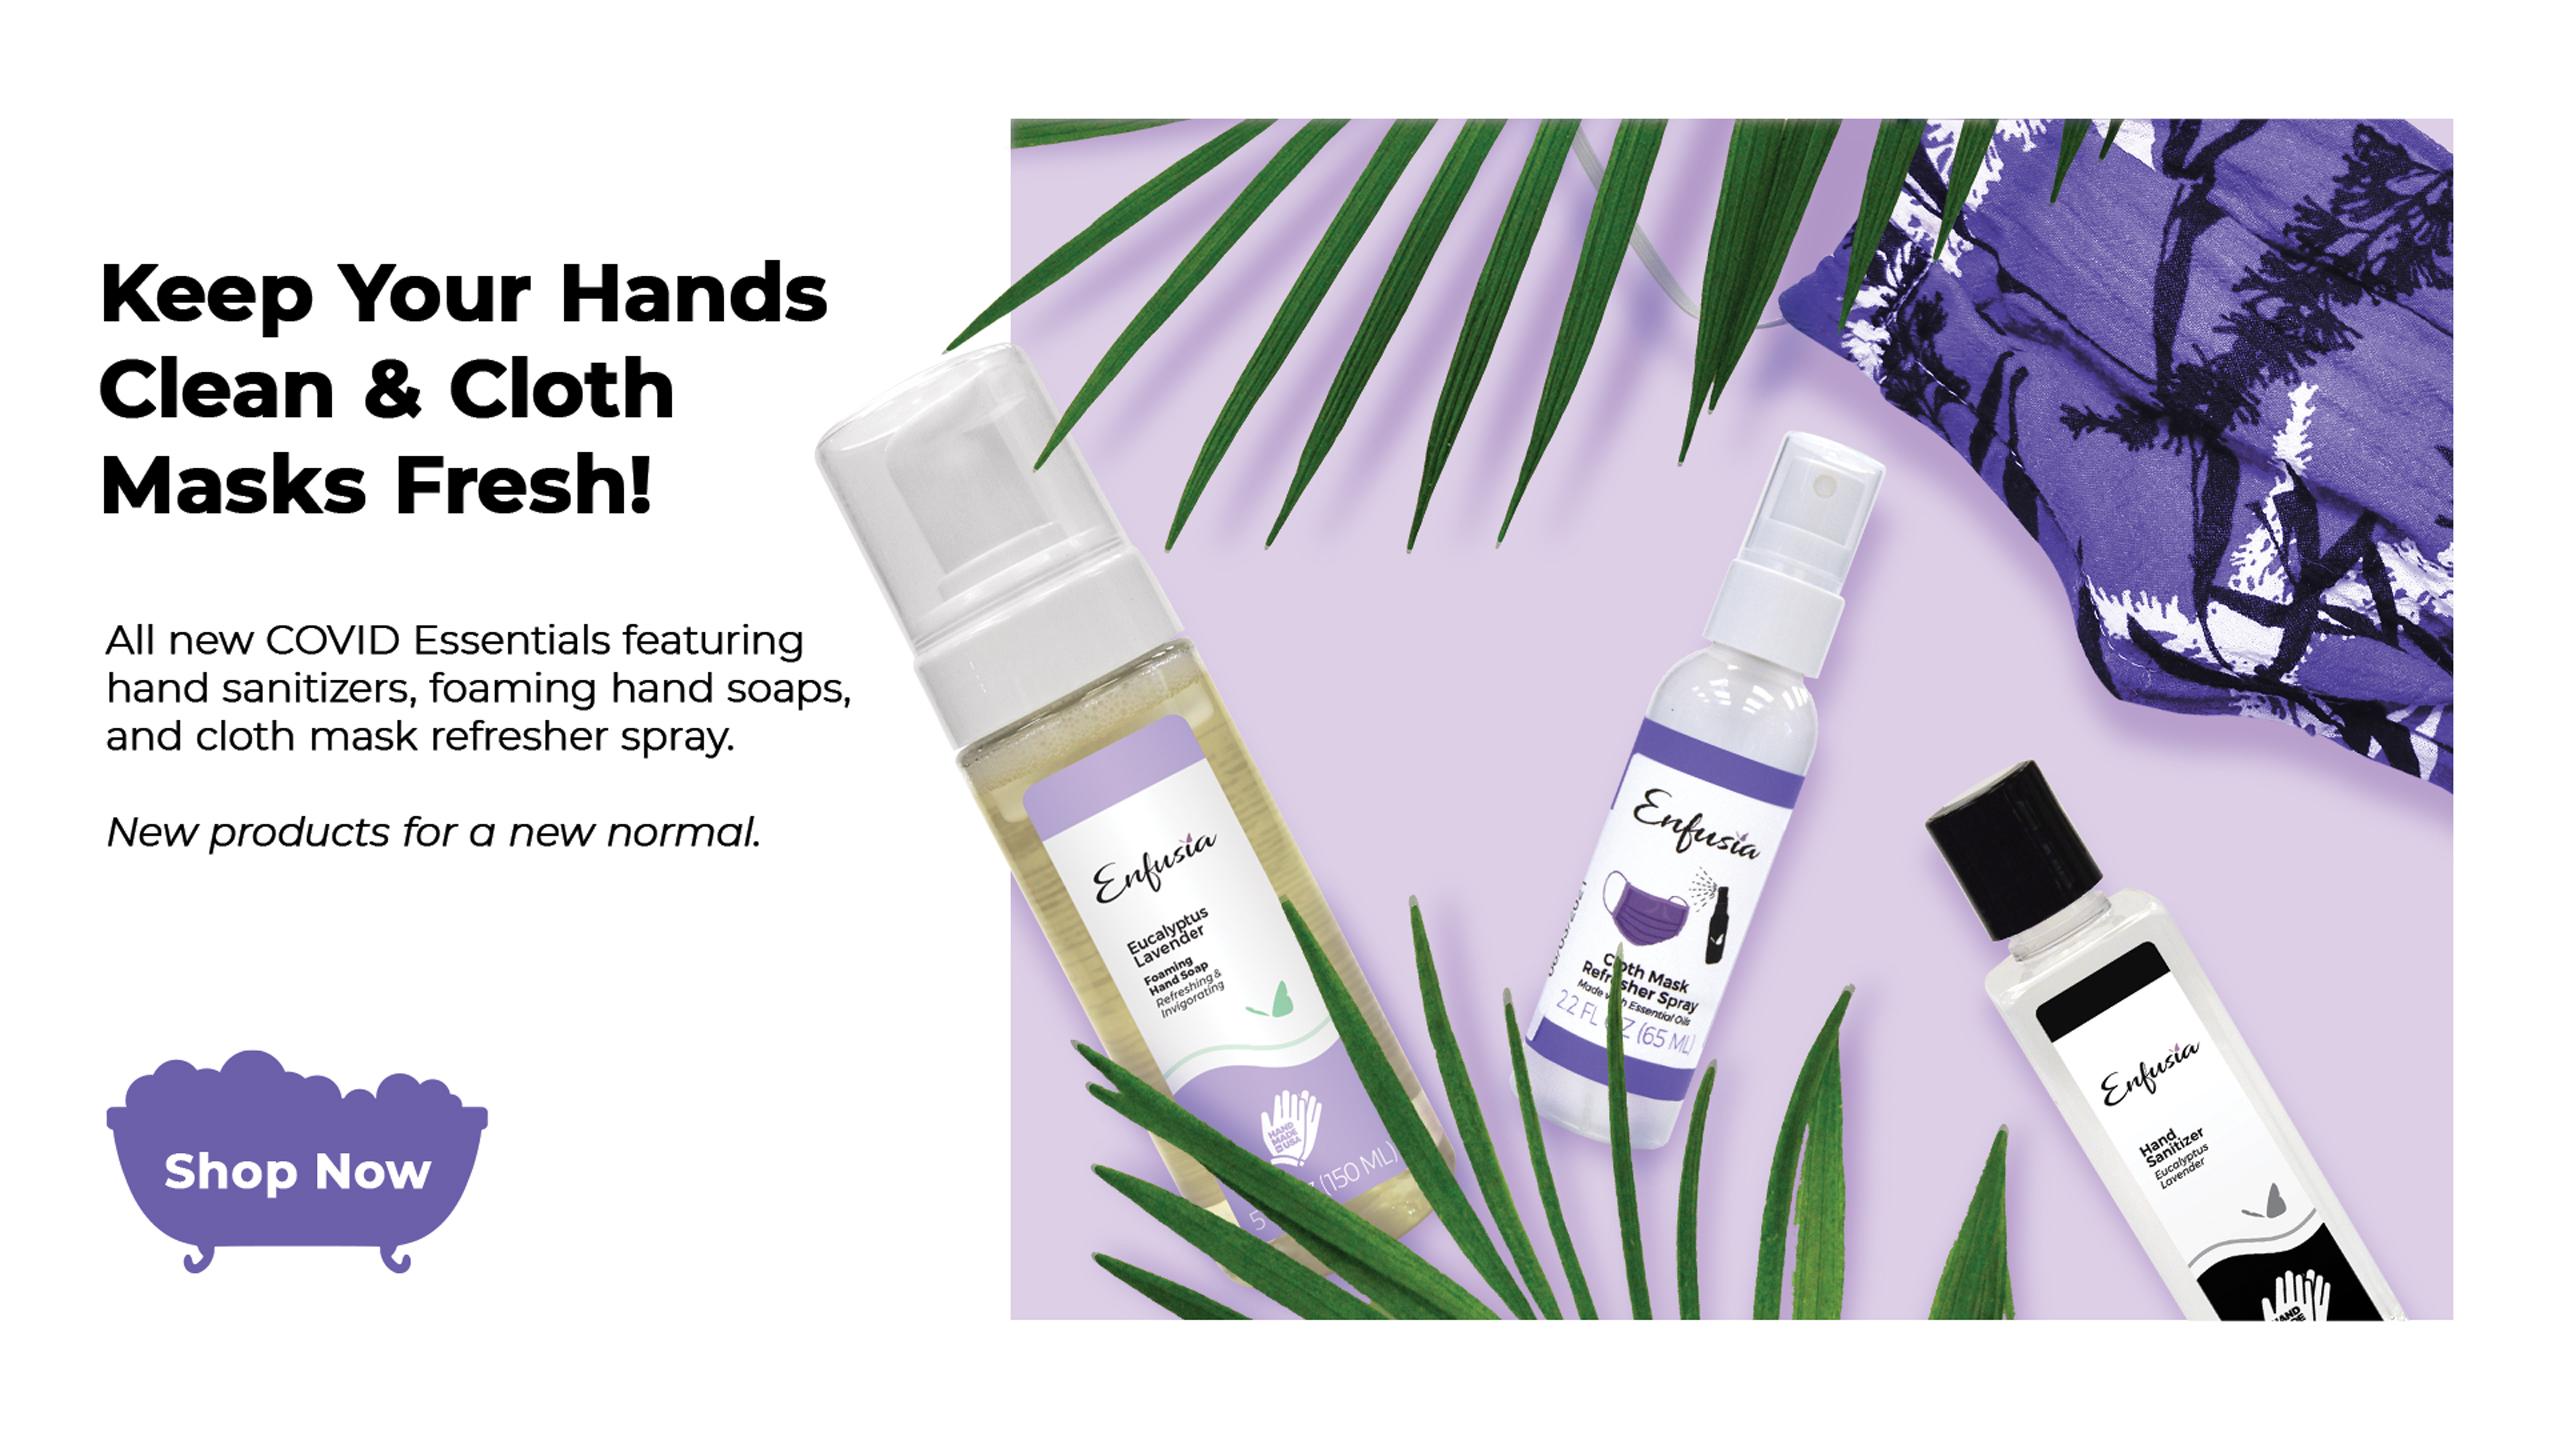 Enfusia Hand Sanitizer Mask Refresher